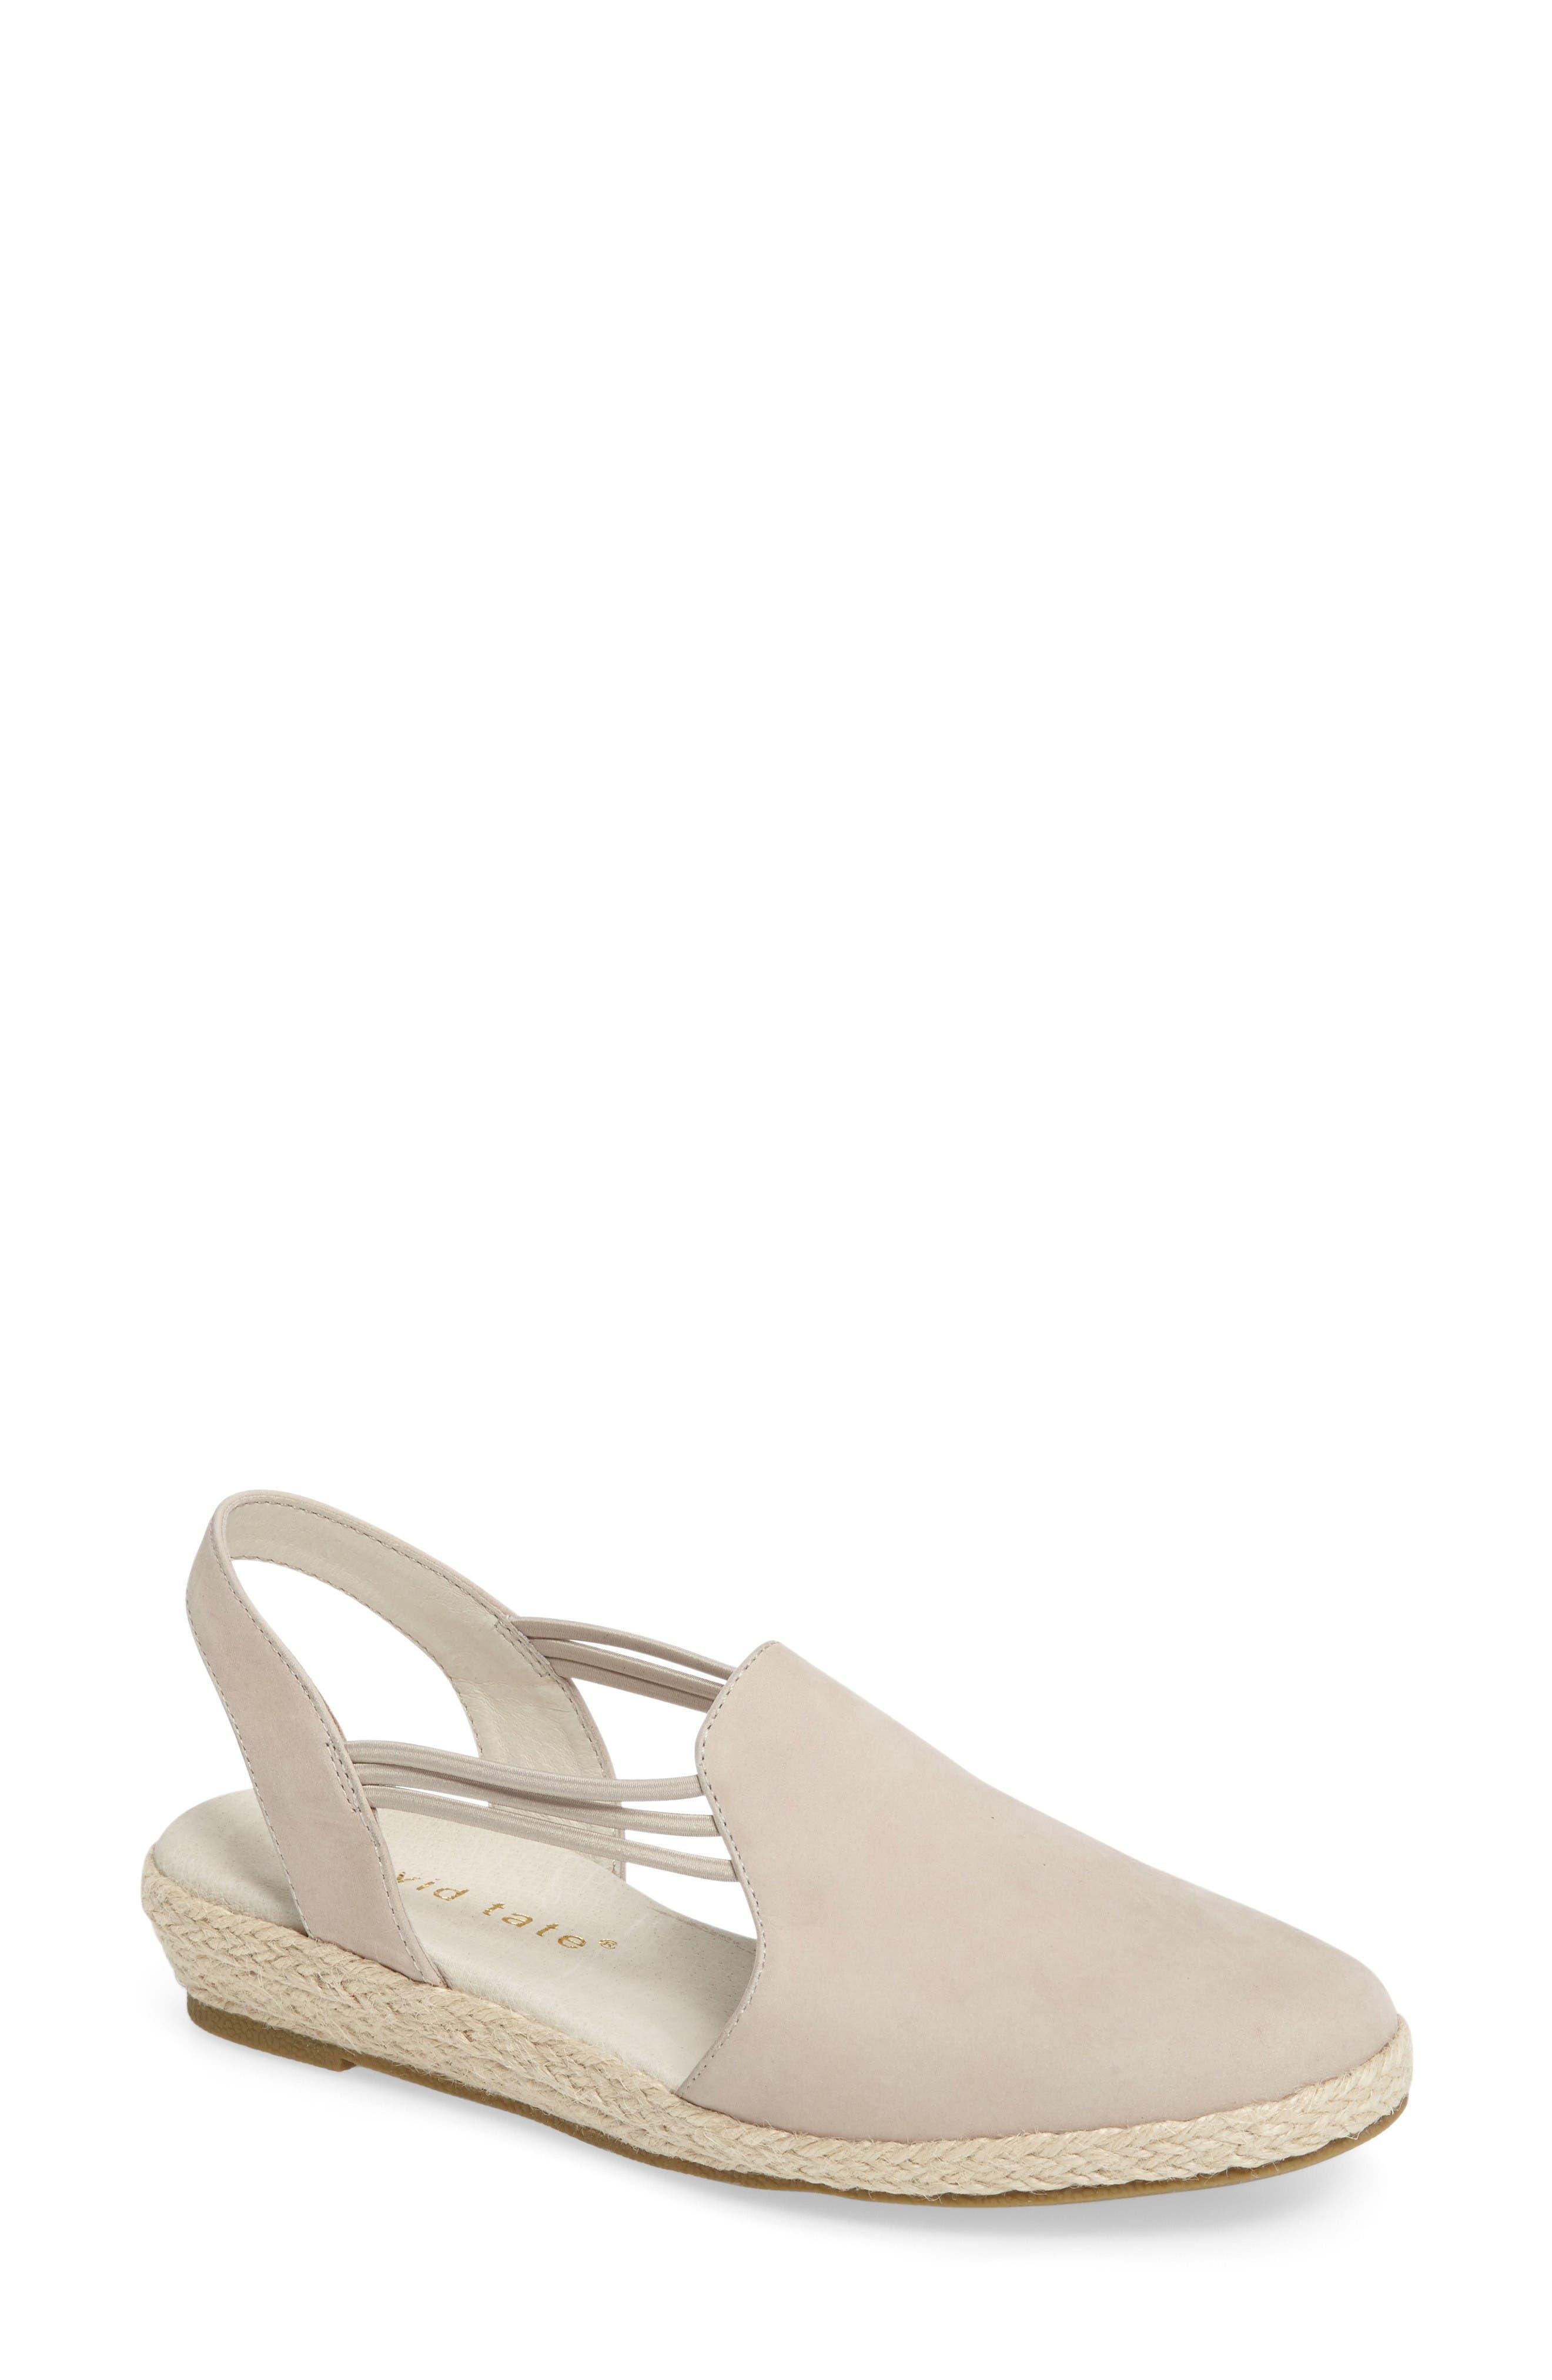 David Tate 'Nelly' Slingback Wedge Sandal (Women)